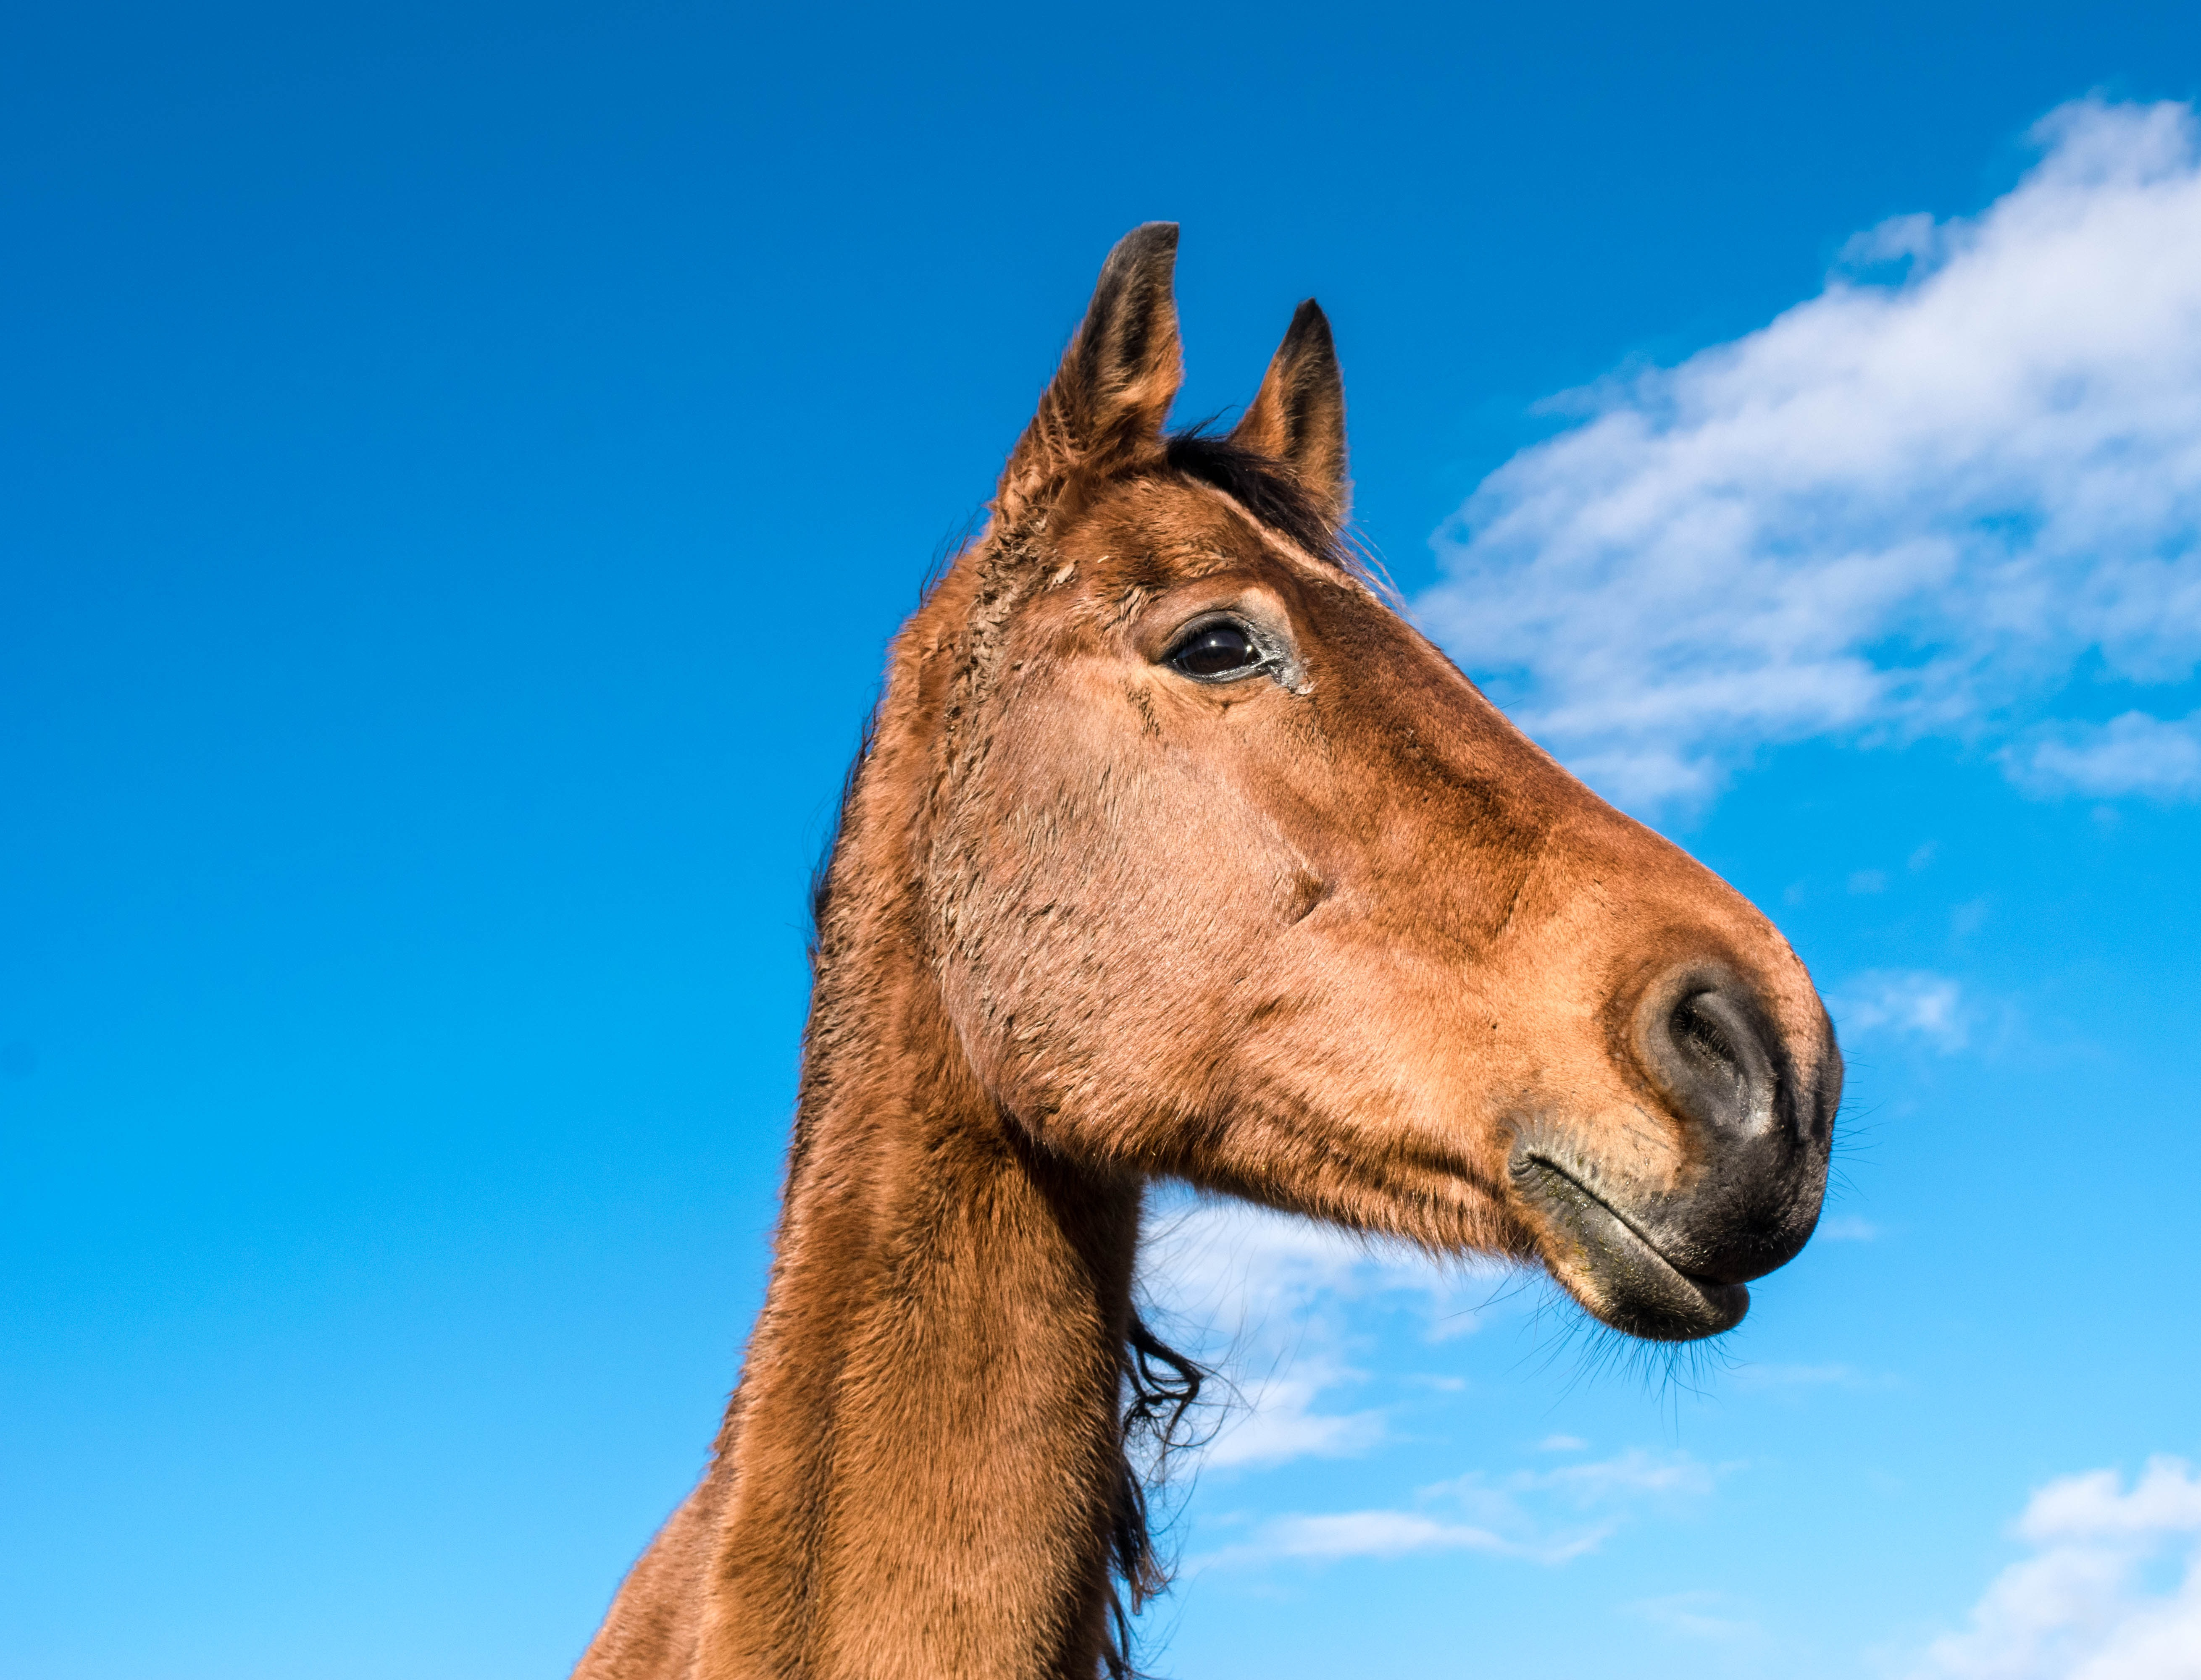 Wild Horse, Animal, Farm, Horse, Nature, HQ Photo